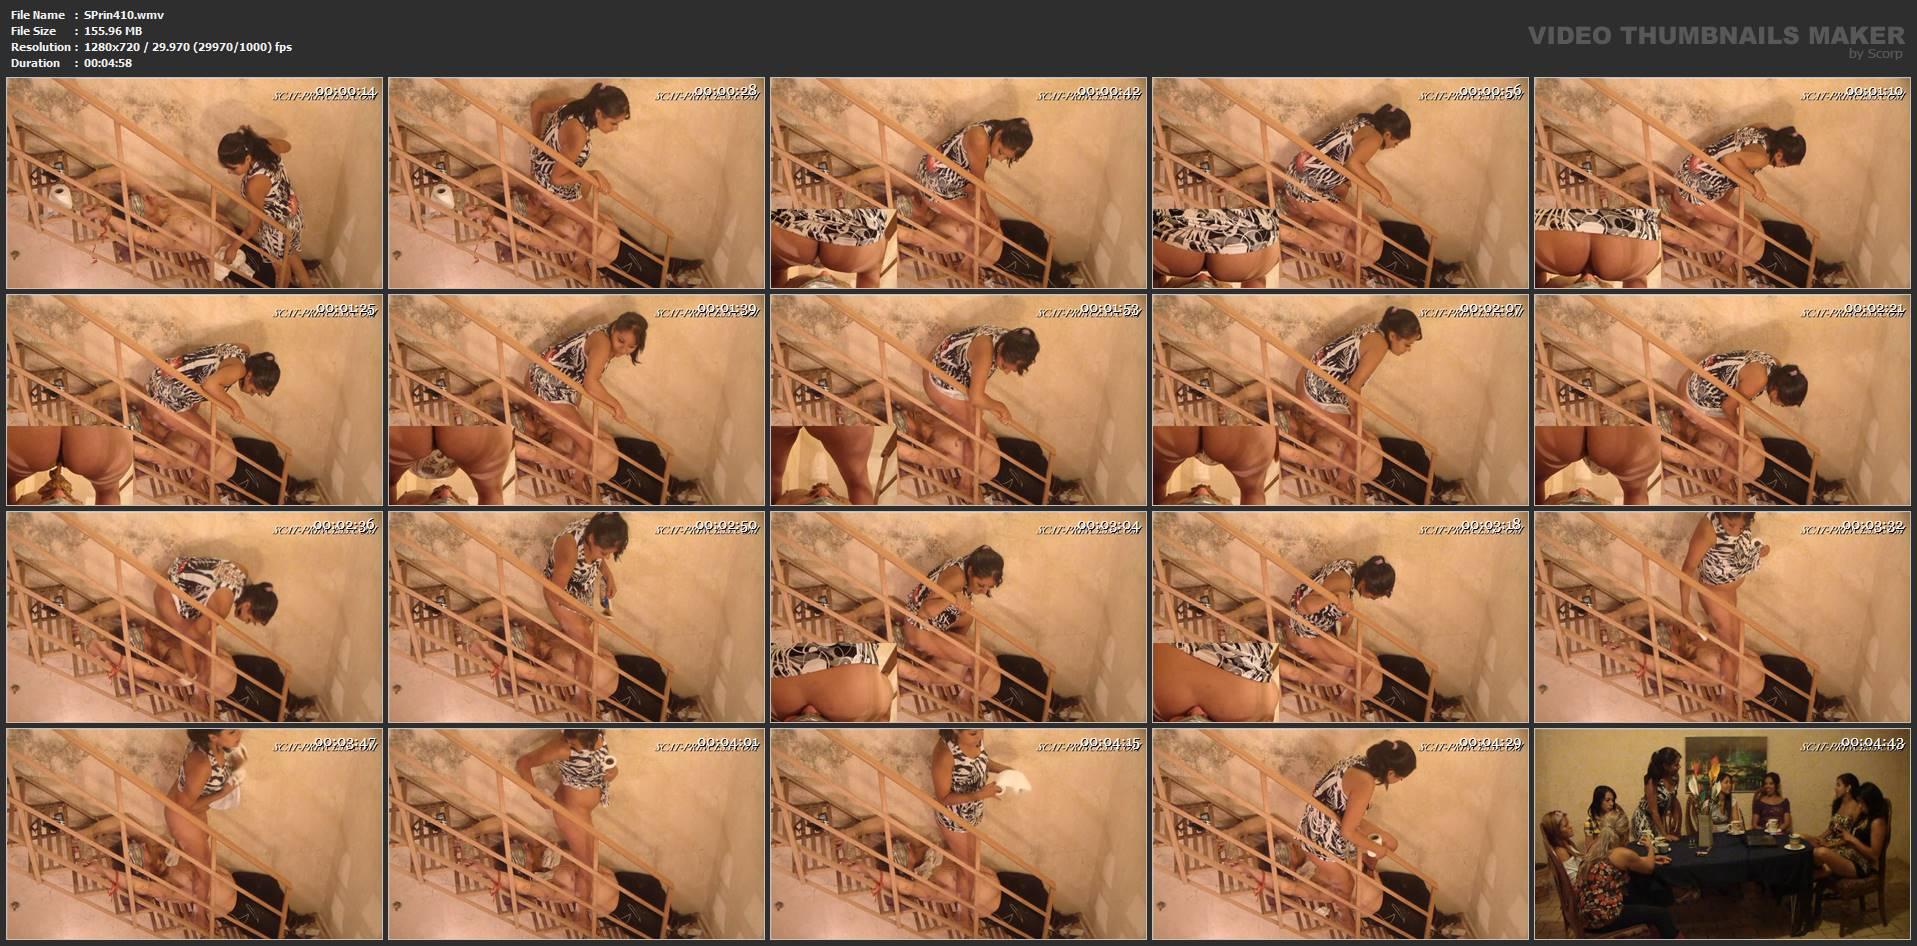 [SCAT-PRINCESS] Chrystal invites Toilet Slave Part 4 Gaby [HD][720p][WMV]